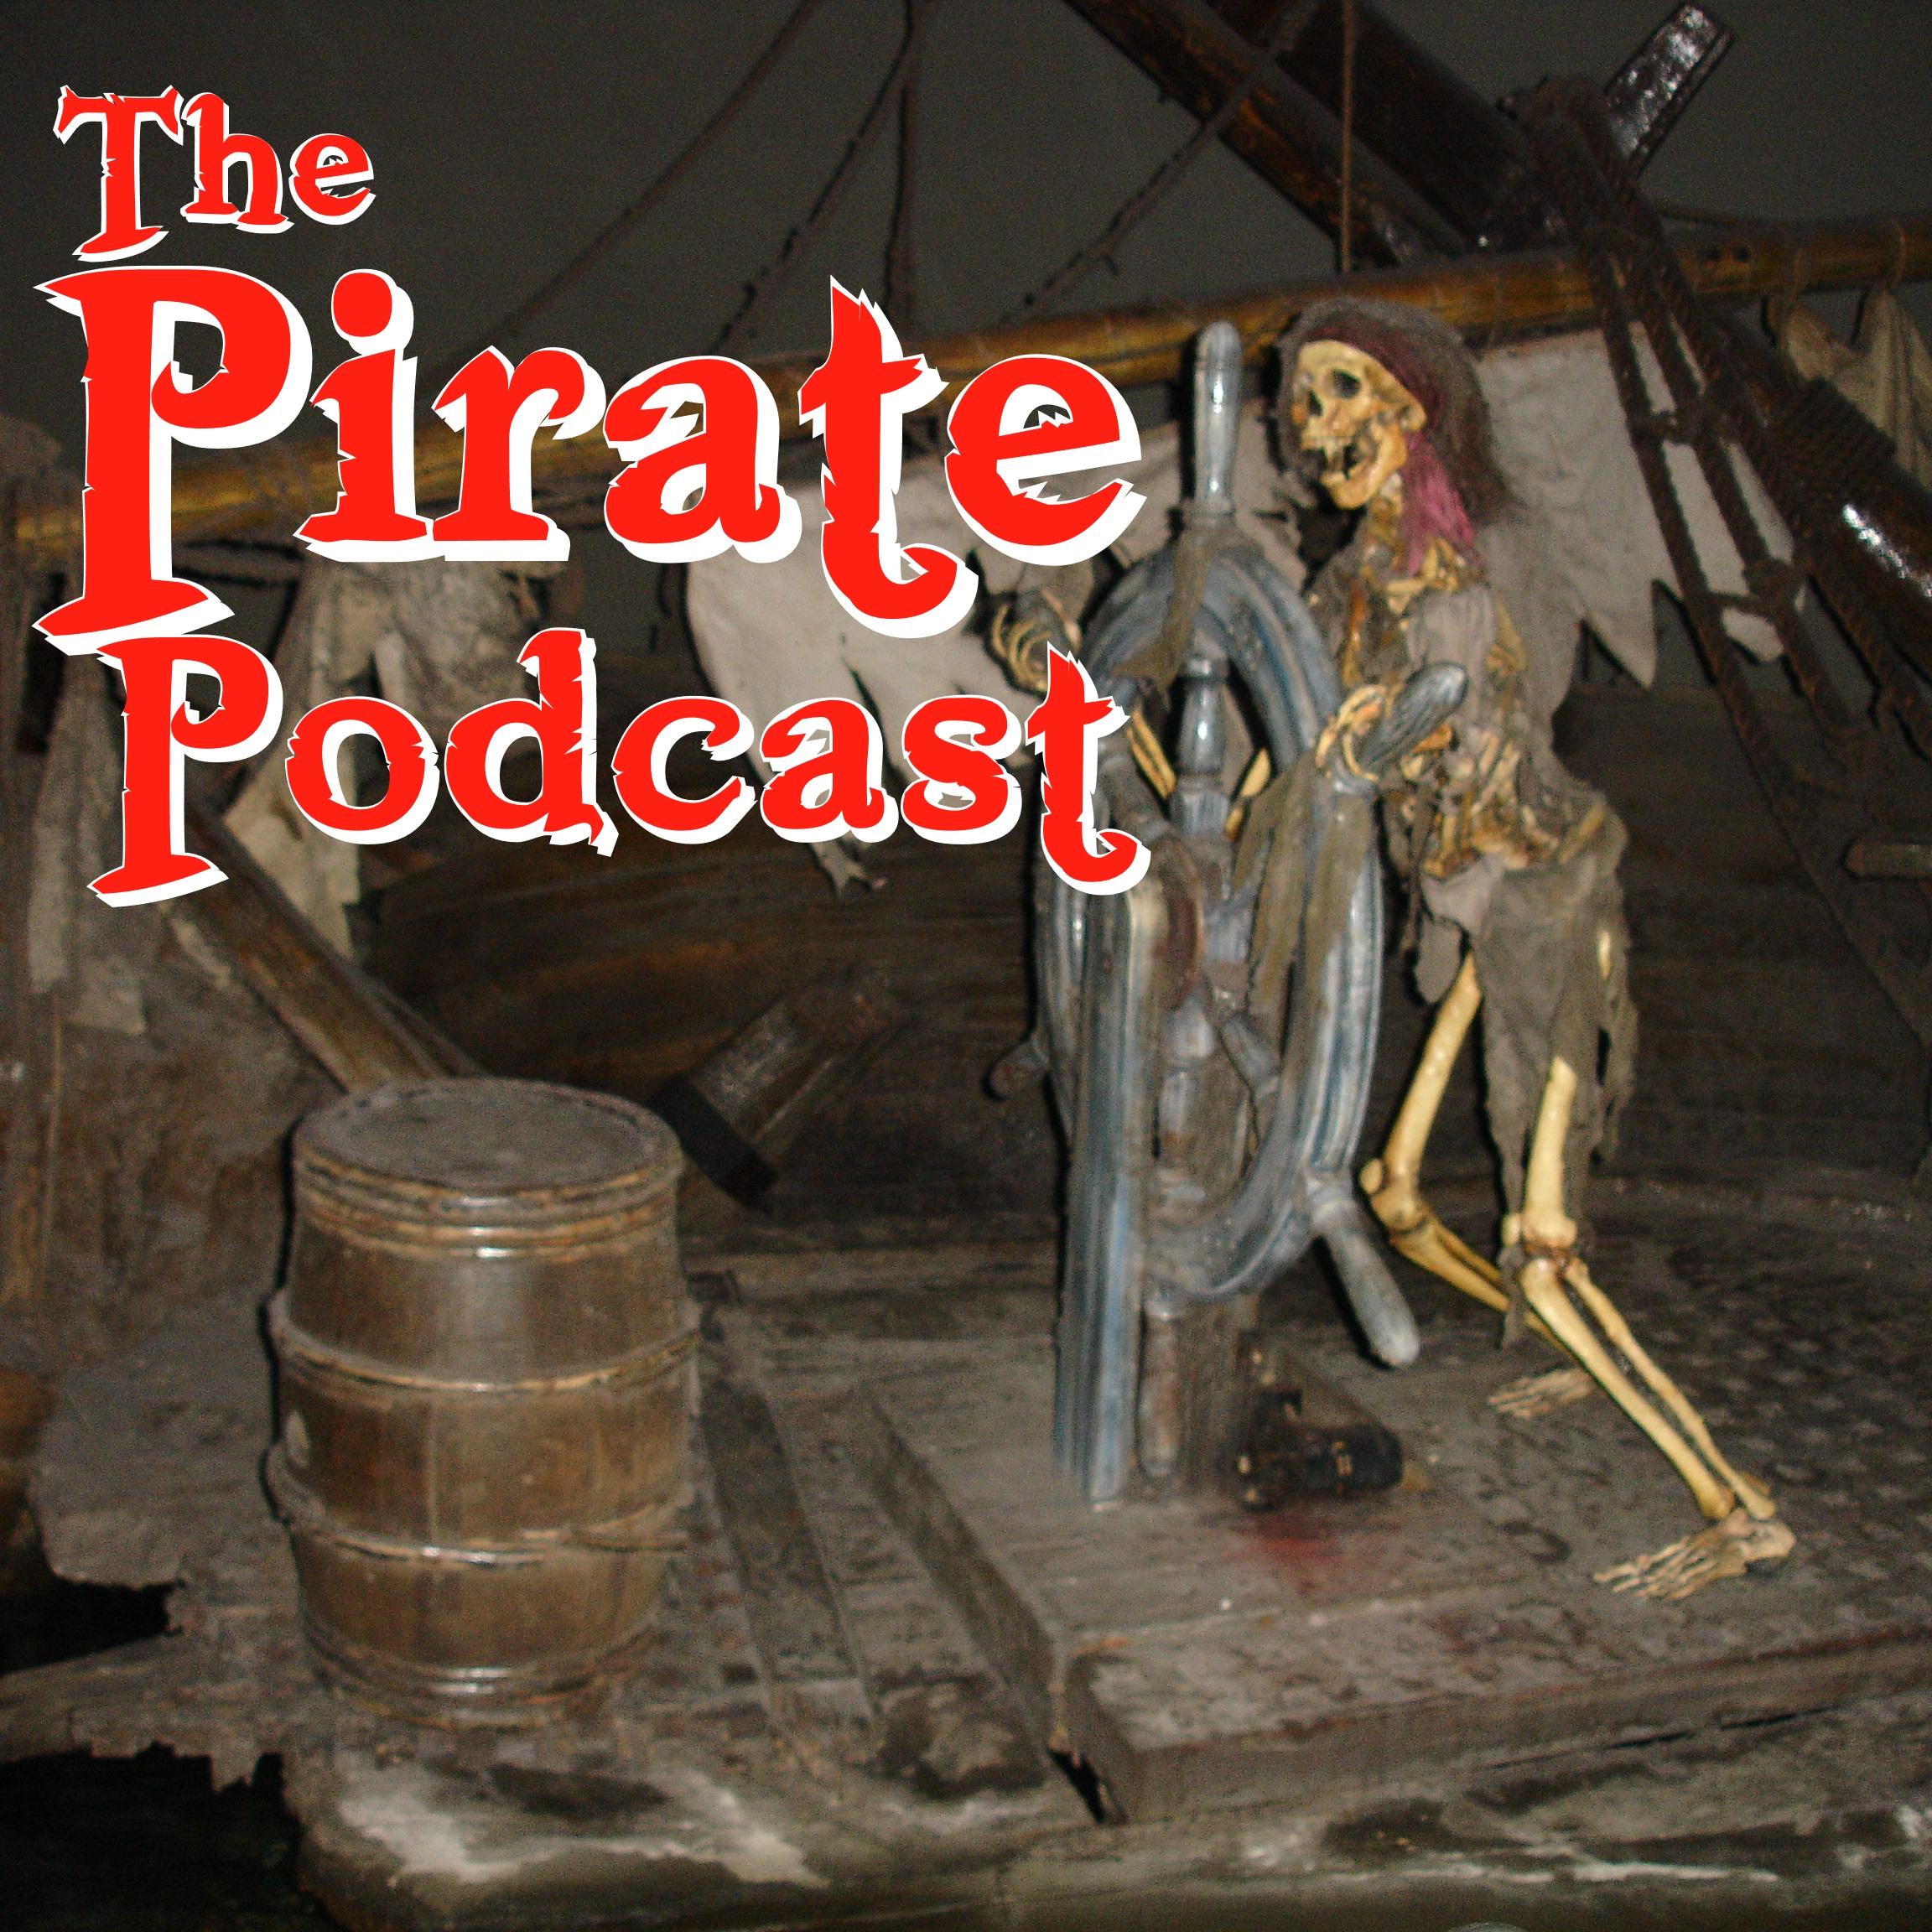 Pirate Podcast